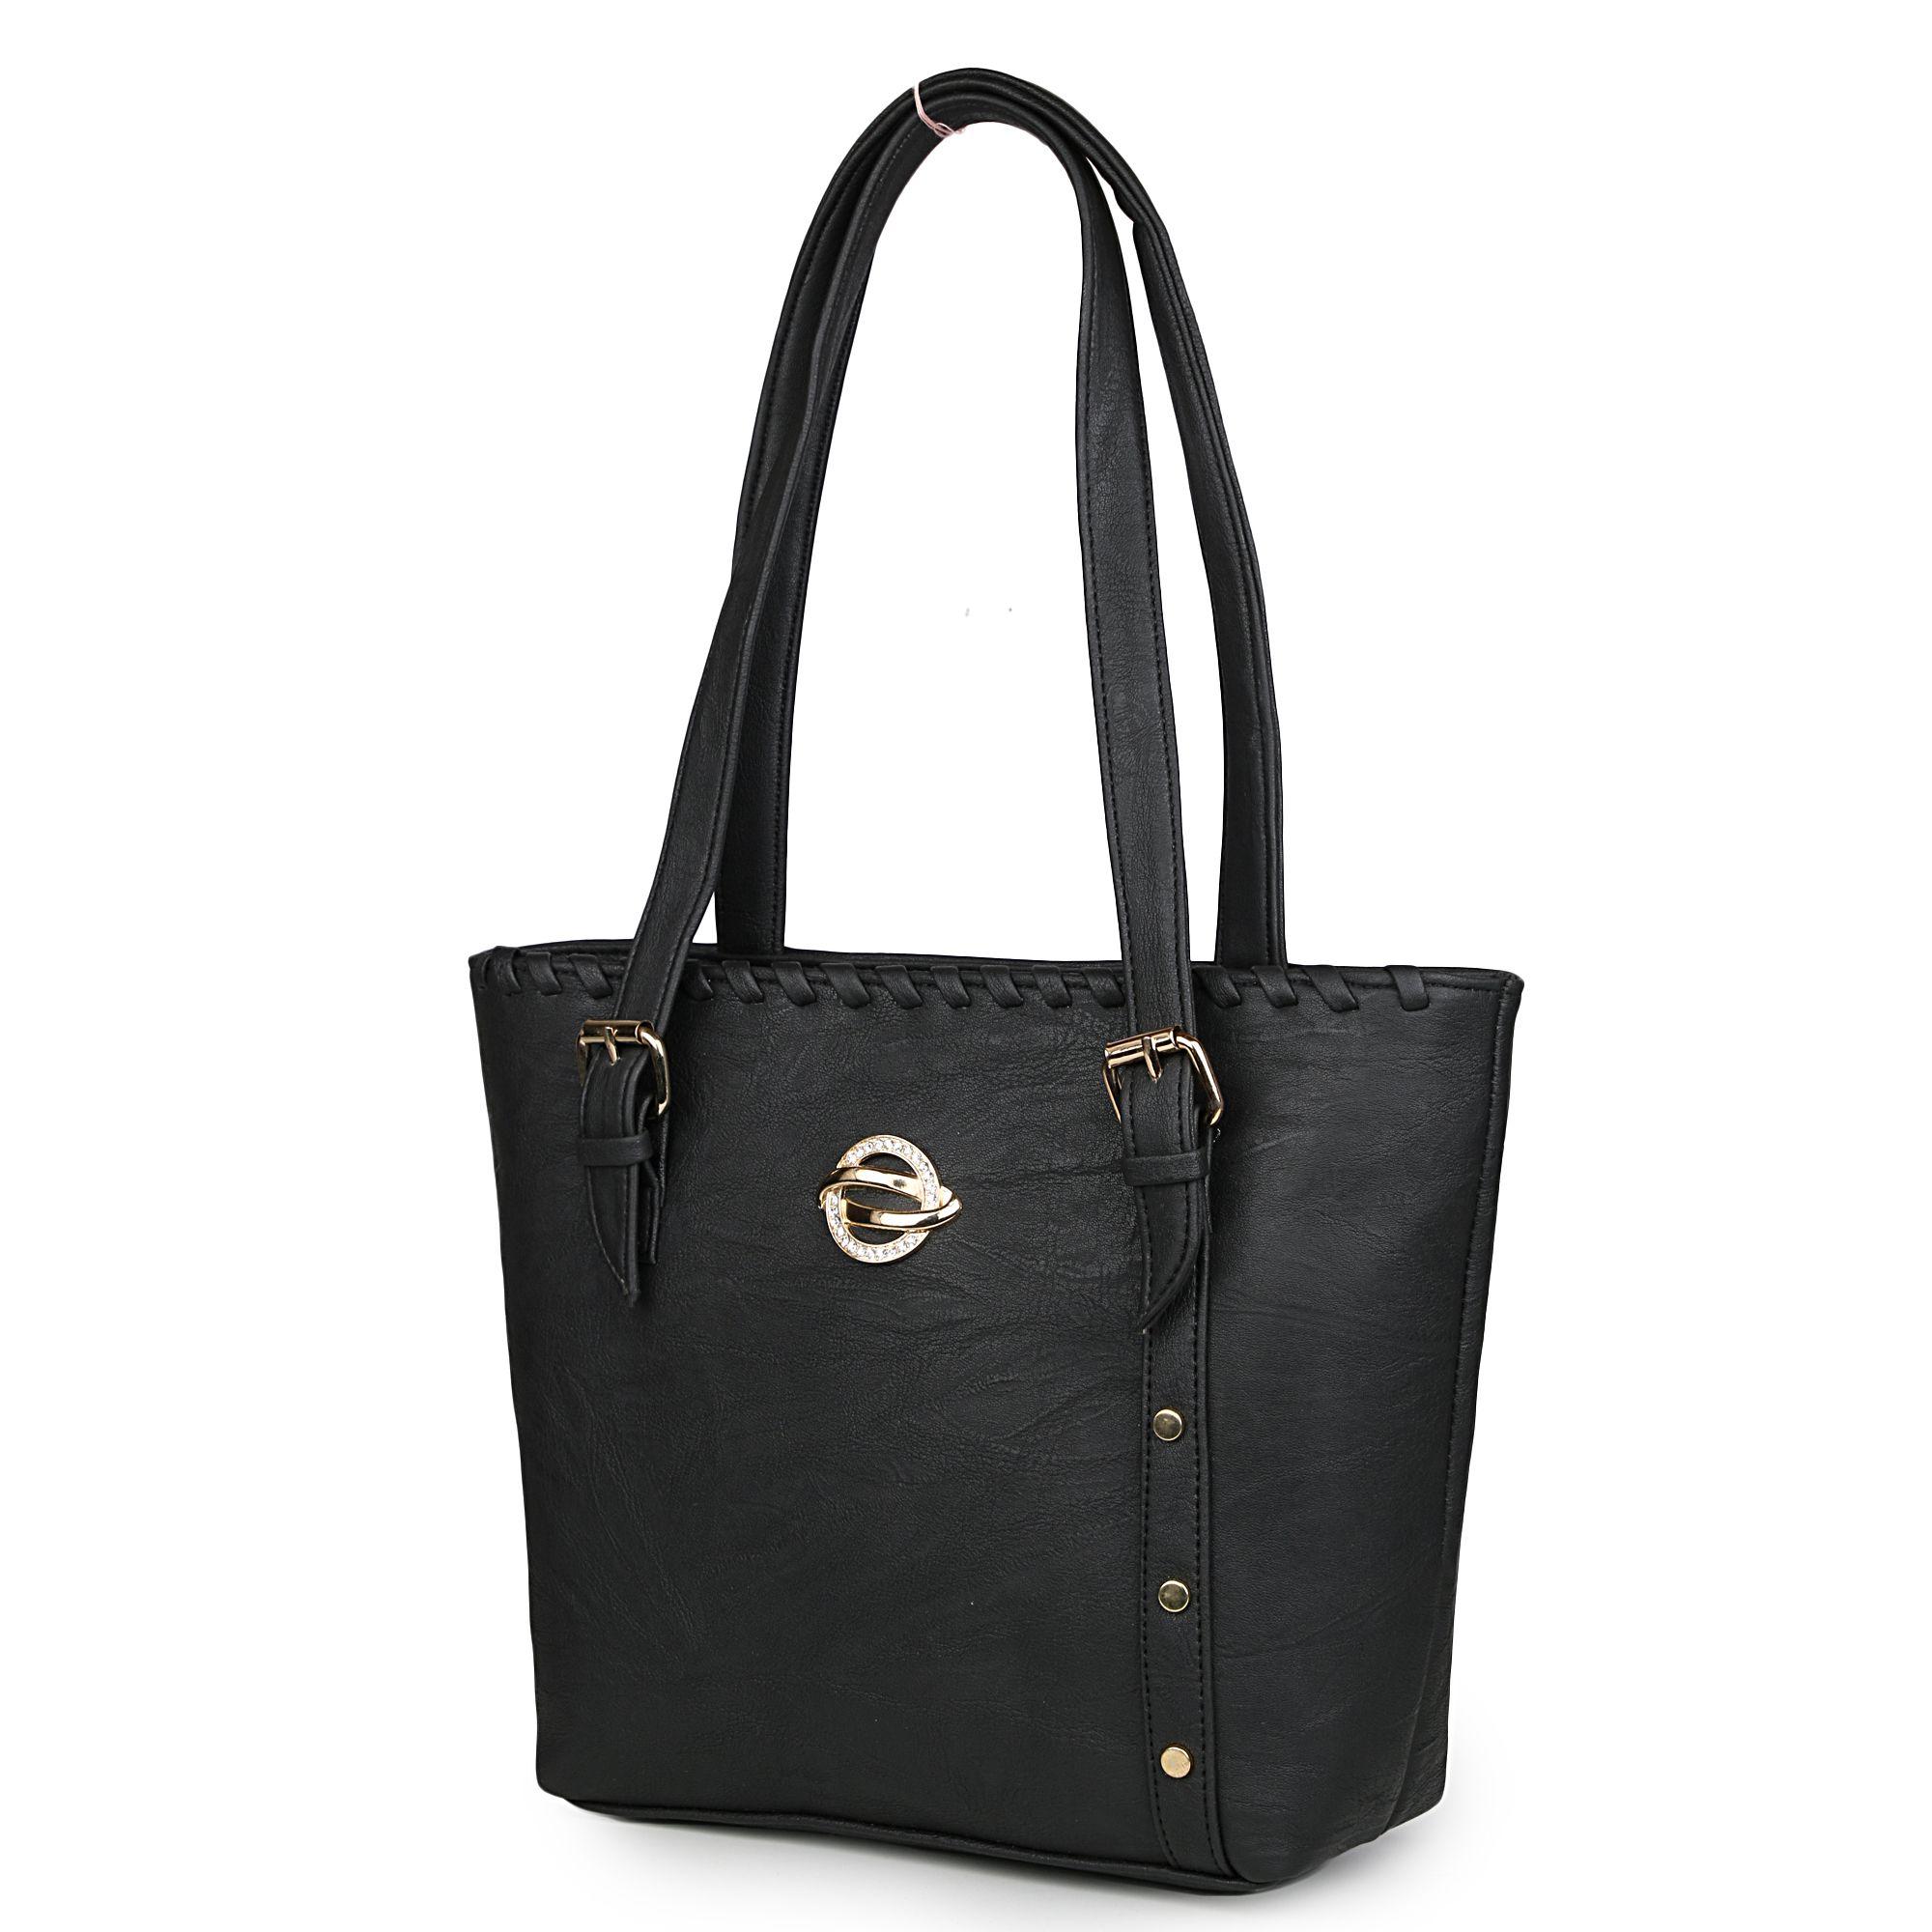 JAZZENTERPRISES Black P.U. Shoulder Bag